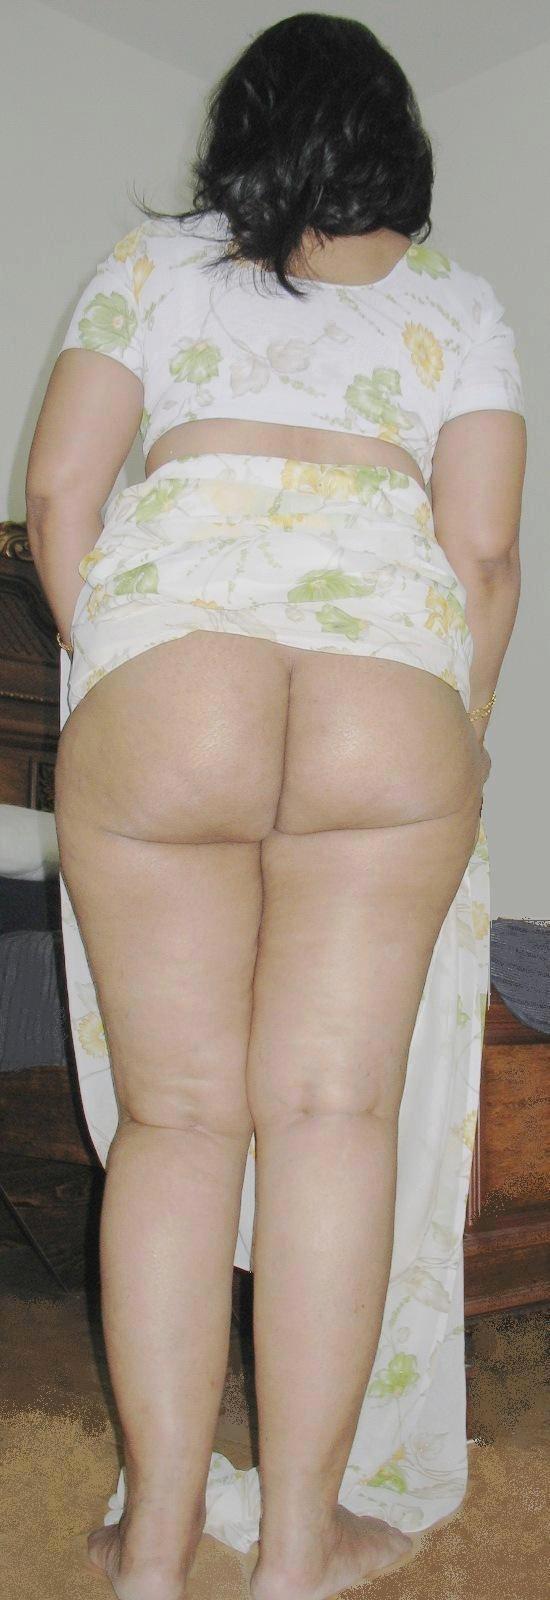 Fat bhabhi big boobs ass photo | Latest moti indian aunty ...